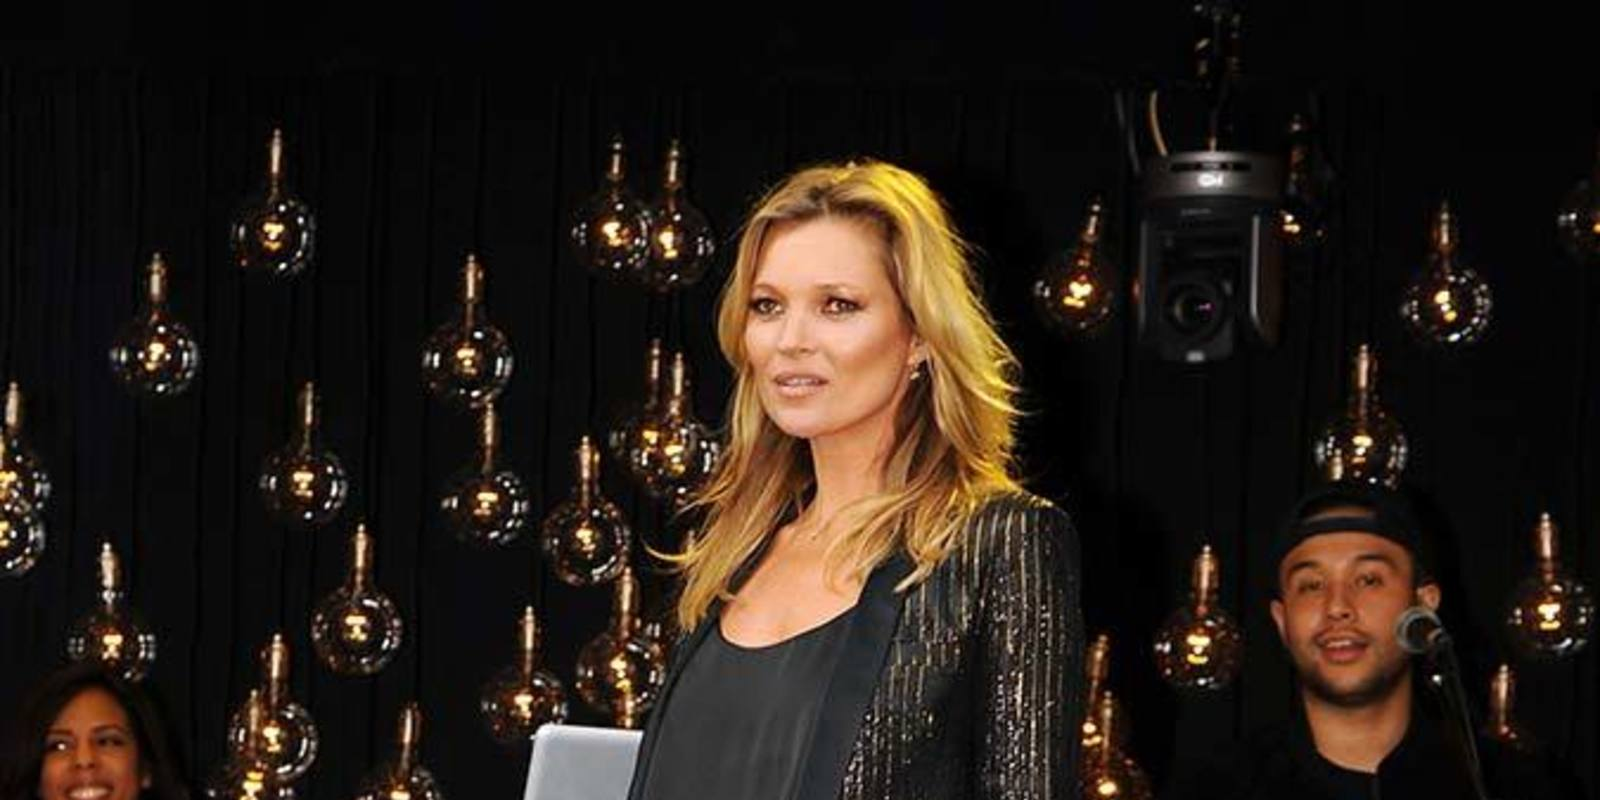 Famous Models Designer Collaborations  sc 1 st  Lilianduval & Female Lighting Designers Uk - Lilianduval azcodes.com